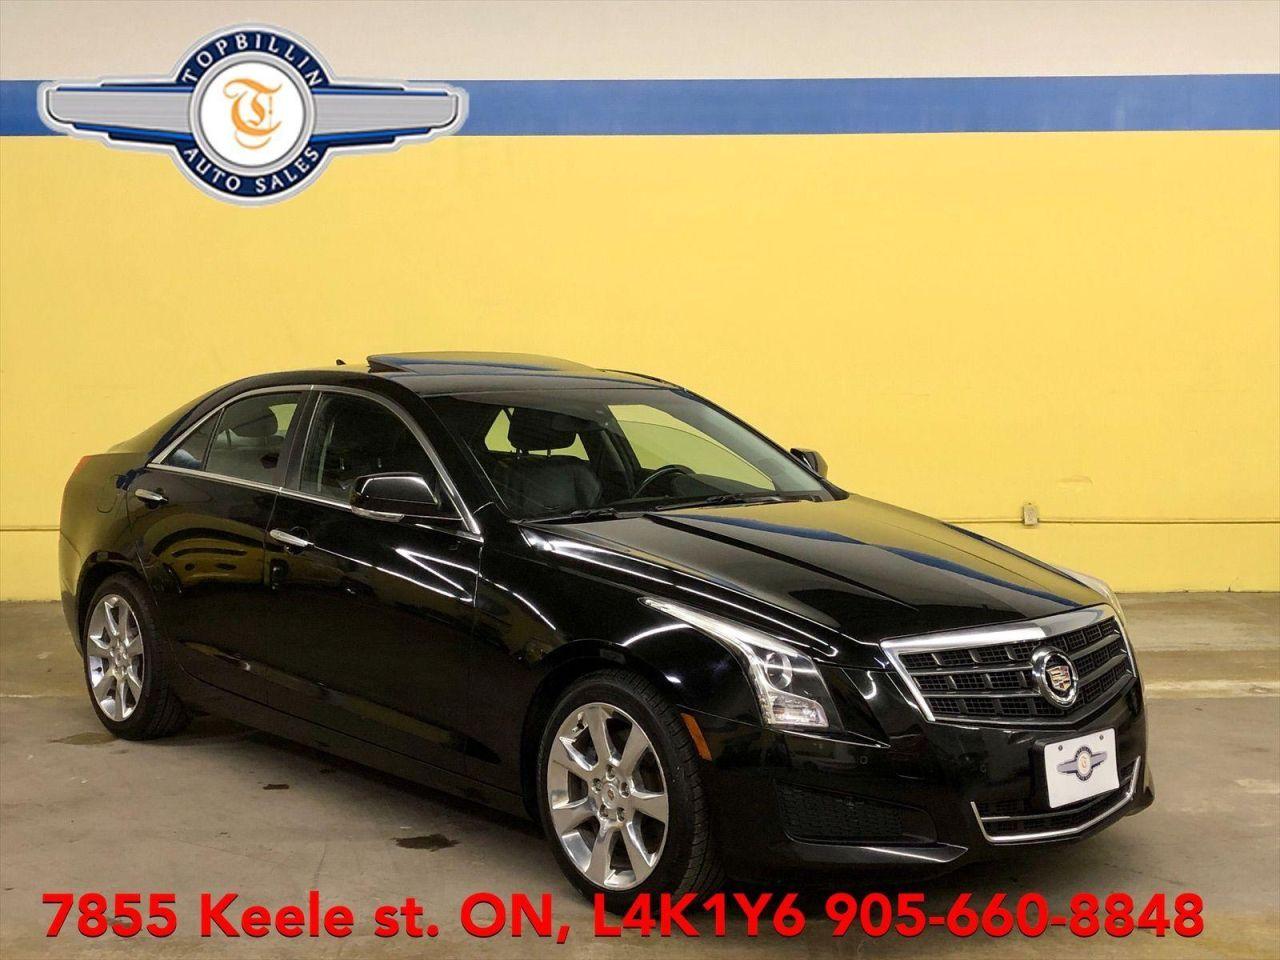 2013 Cadillac ATS Luxury, Leather, Sunroof, Back-up Cam